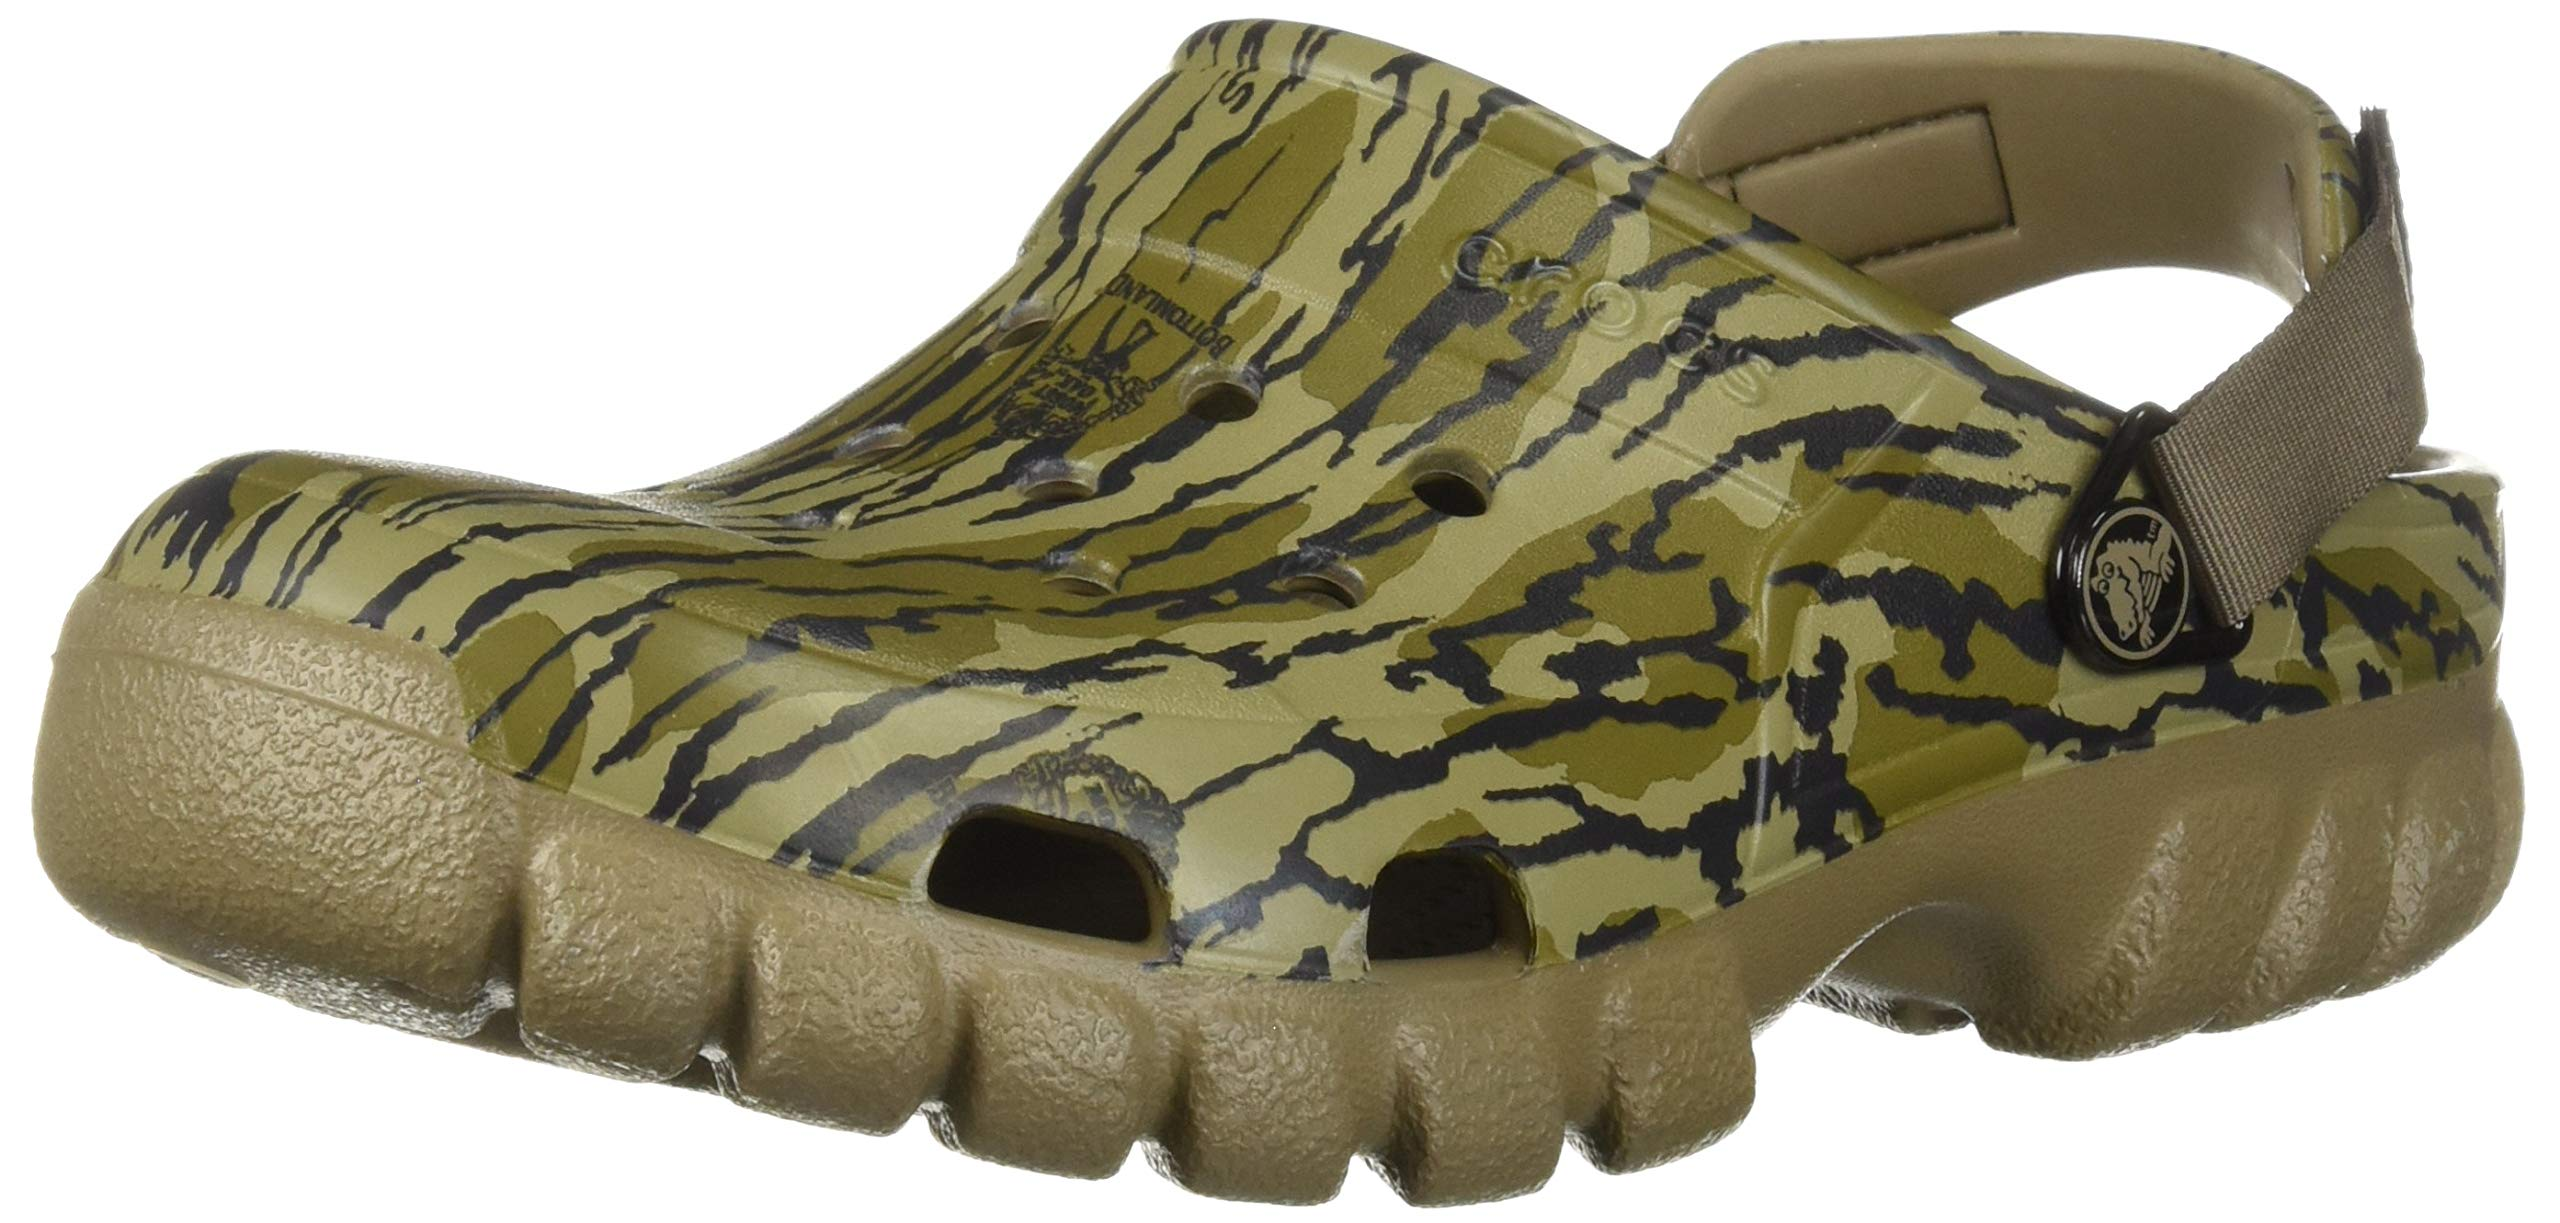 Crocs Offroad Sport Mossy Oak Bottom Clog, Khaki, 10 US Men/ 12 US Women M US